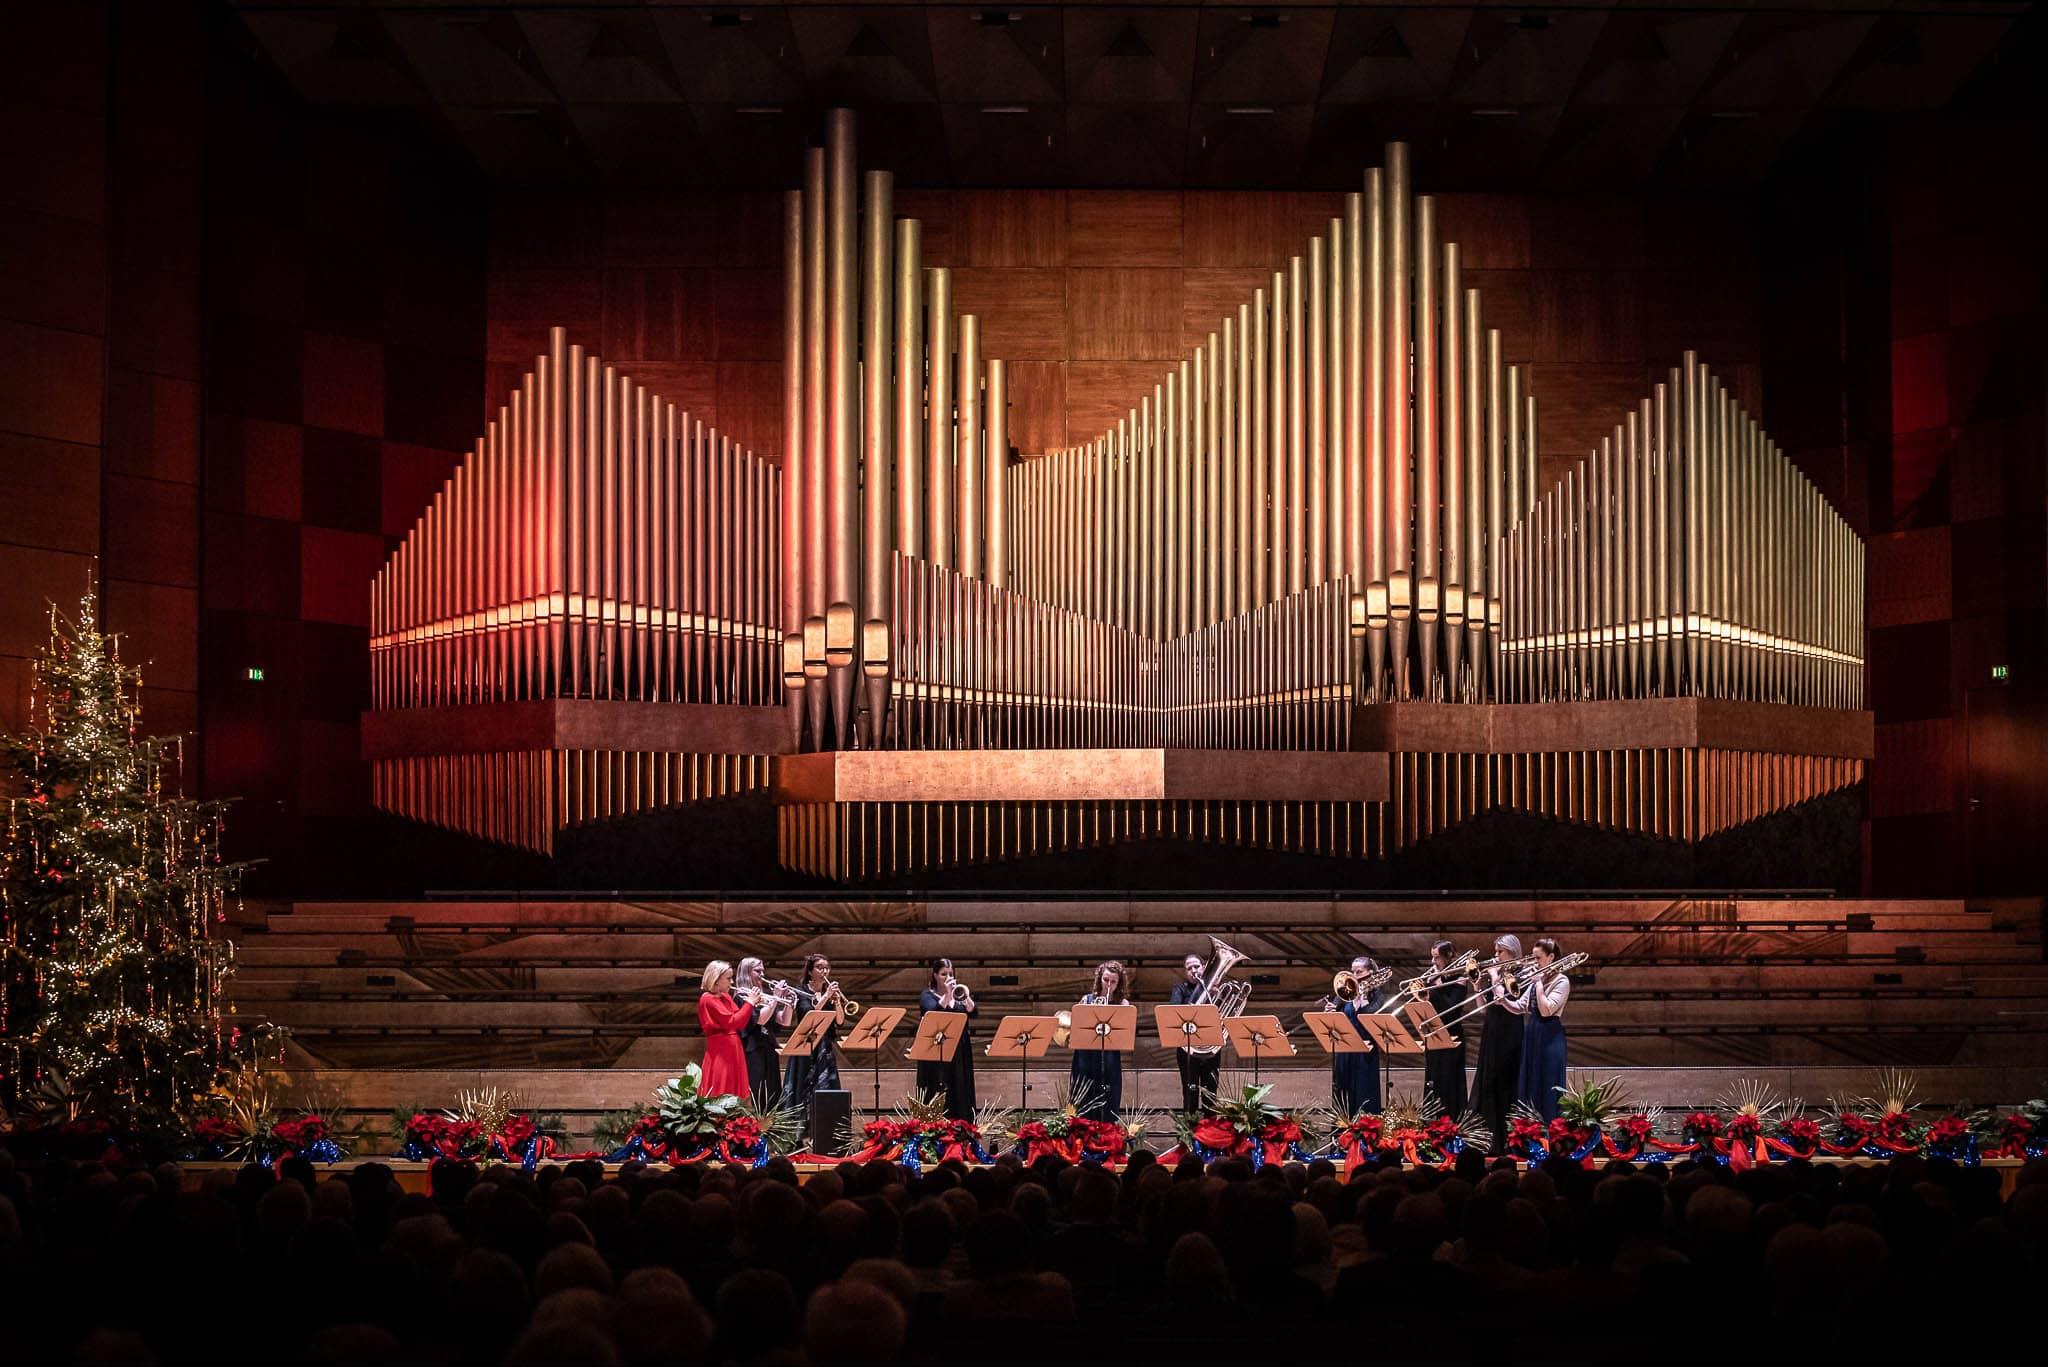 tenThing, Christmastour 2018, Fotografie klassischer Konzerte